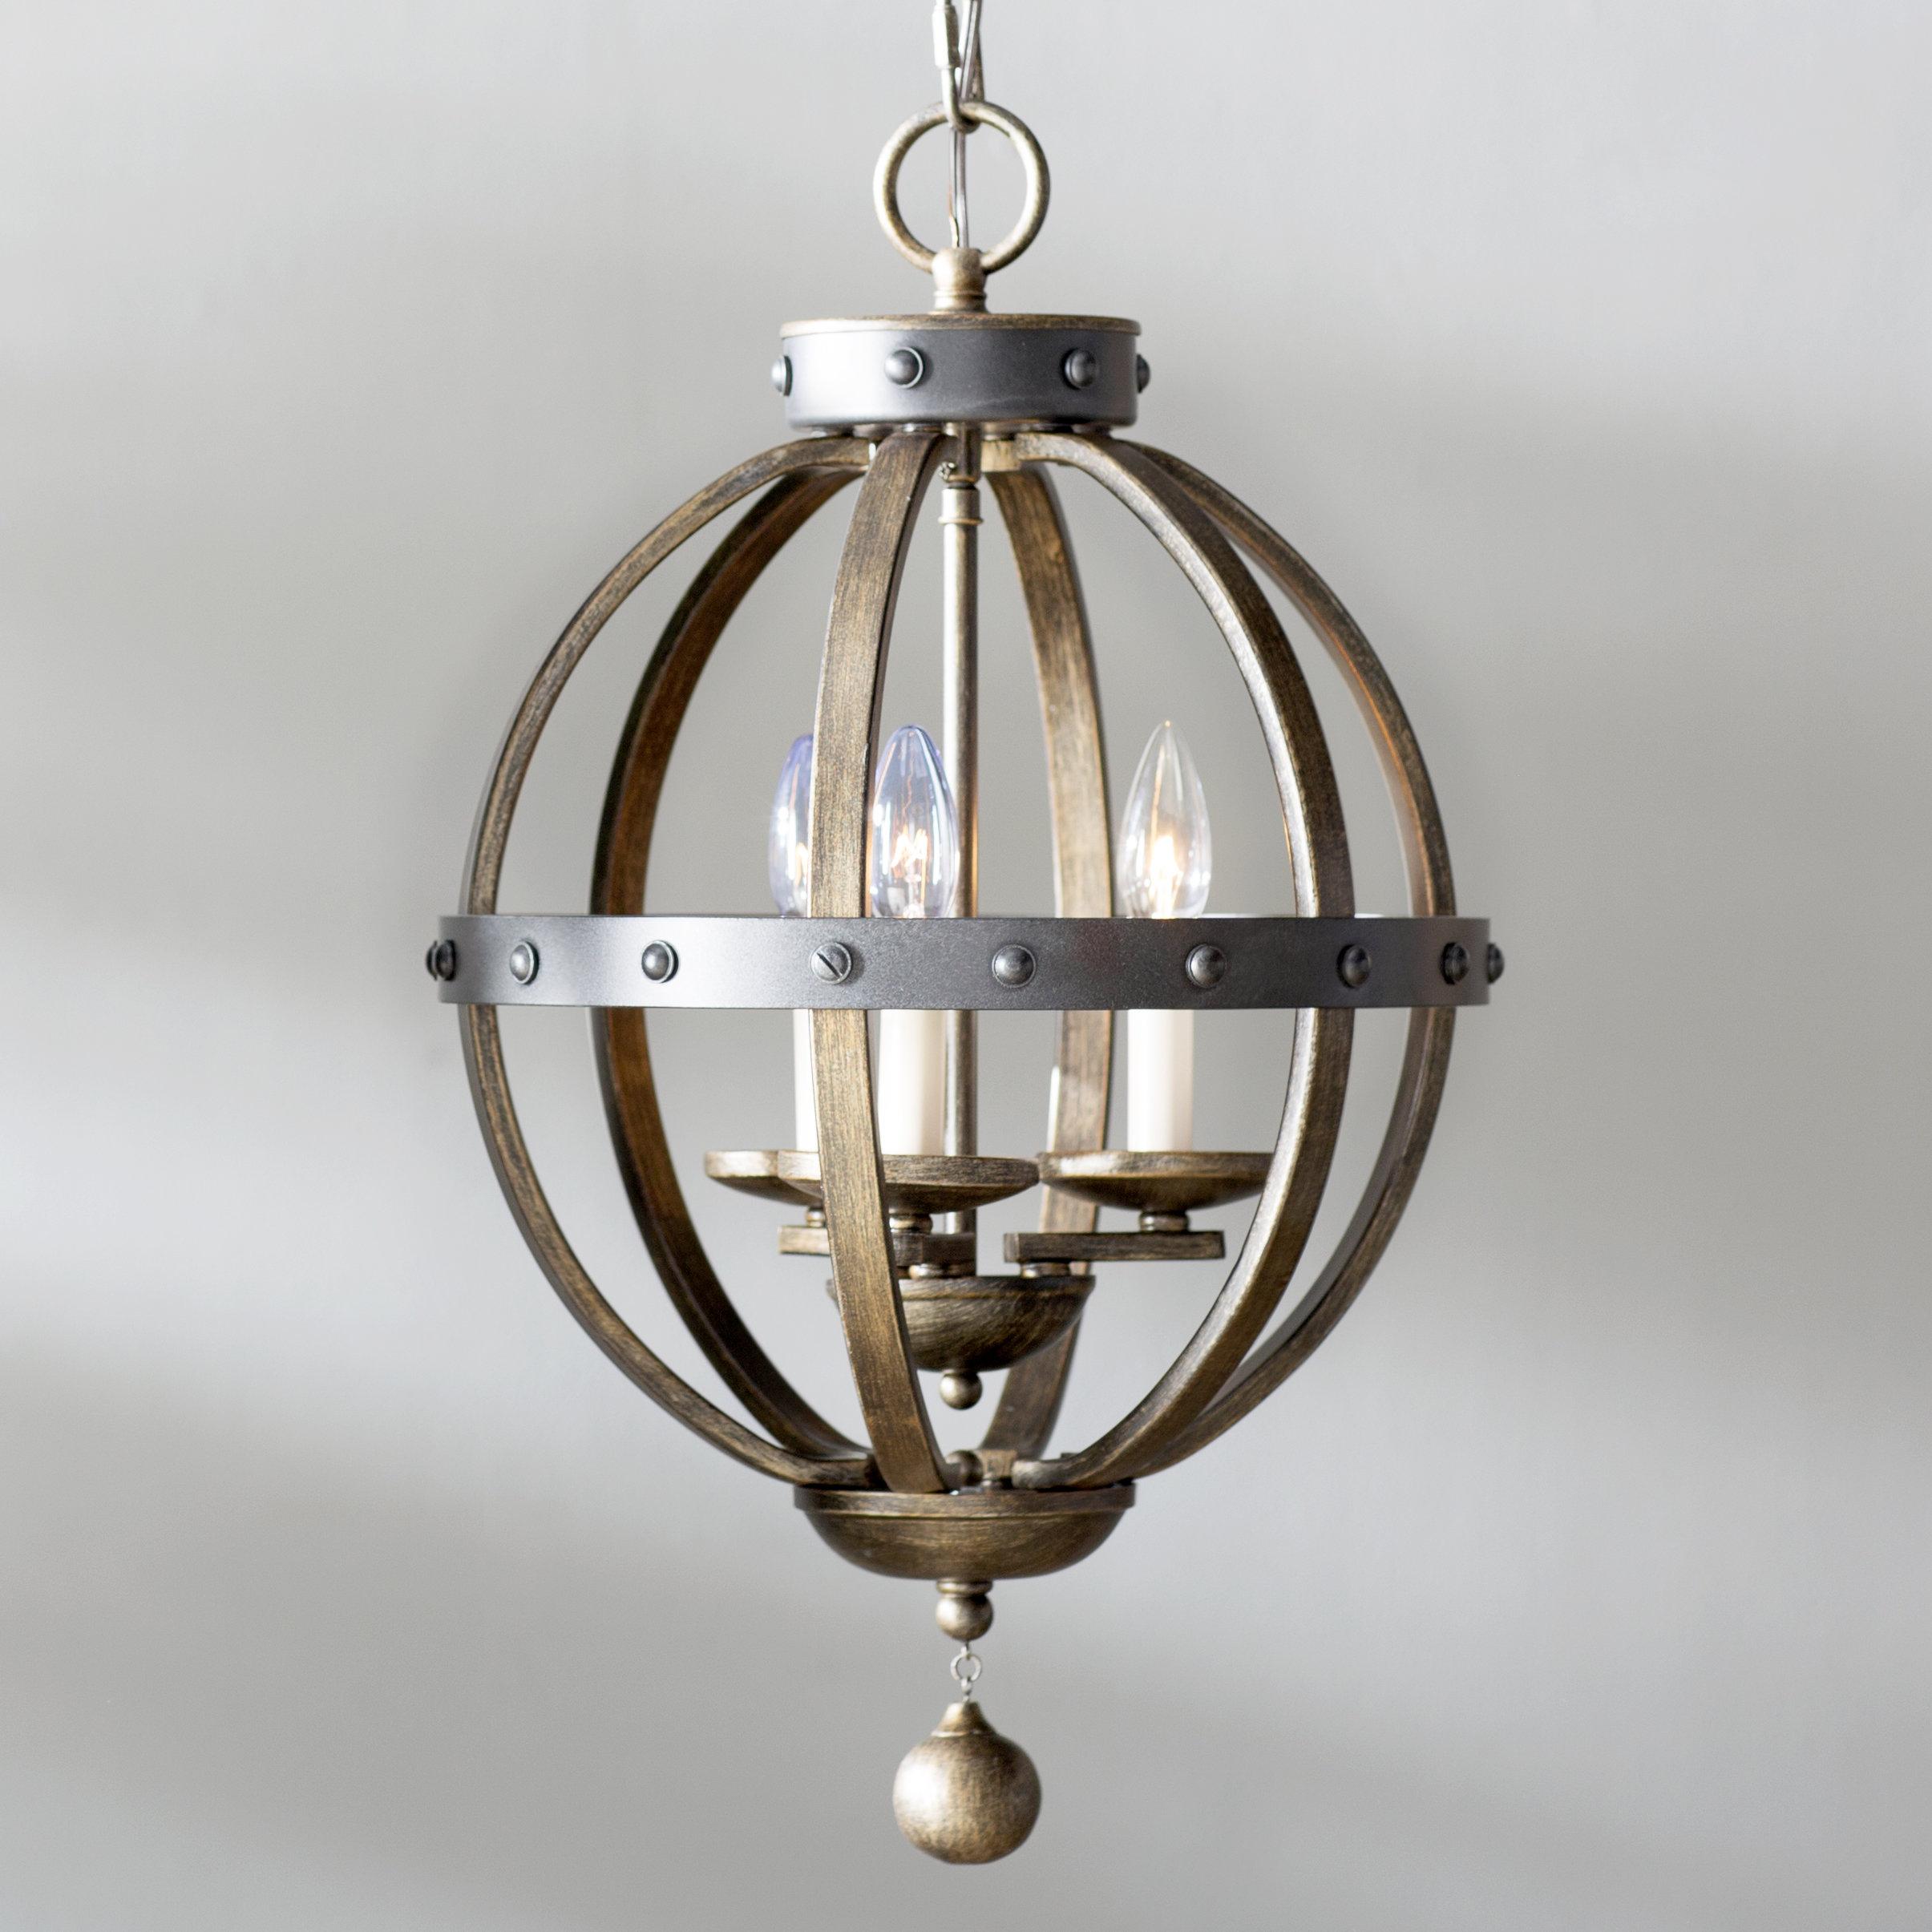 Wilburton 3 Light Globe Chandelier In La Sarre 3 Light Globe Chandeliers (View 5 of 30)